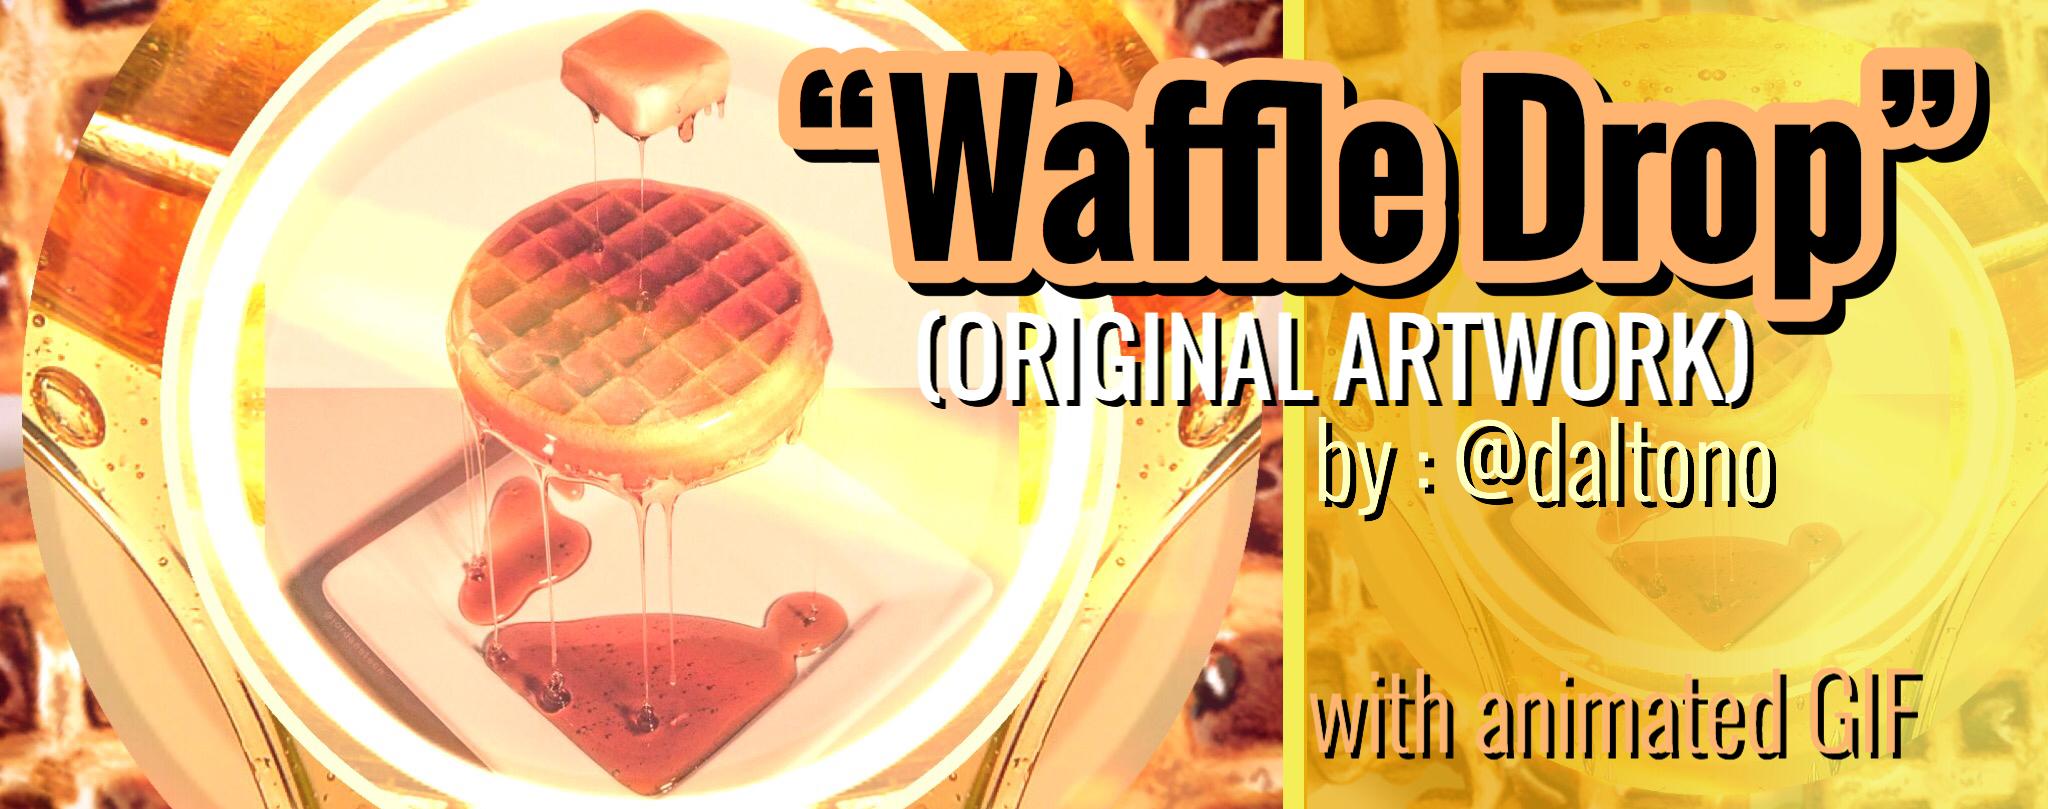 waffle-drop-thumbnail.JPG